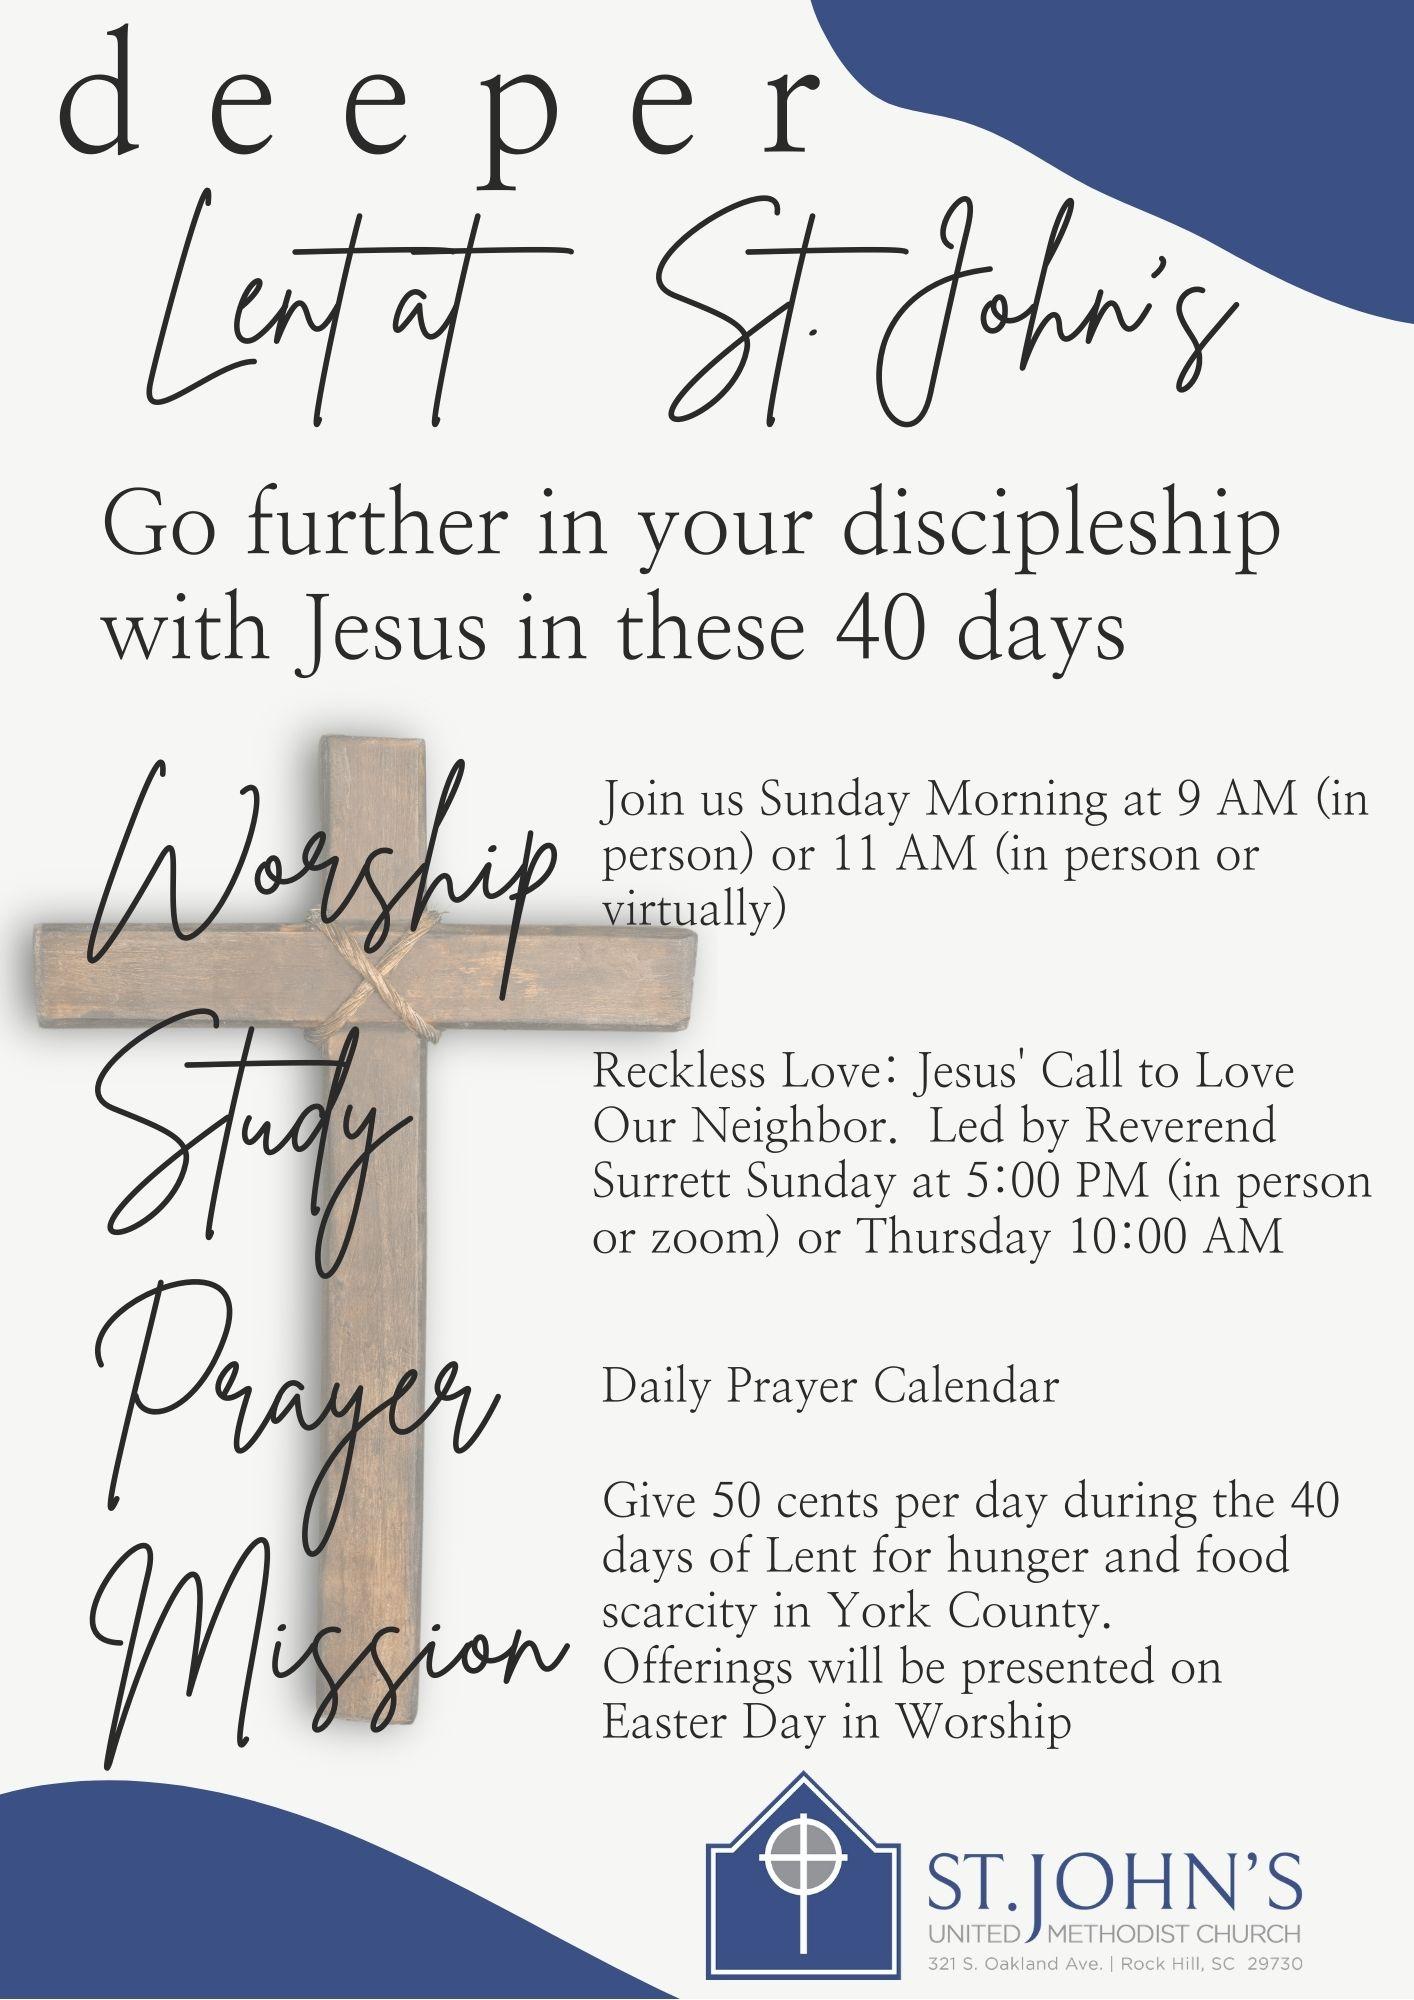 Copy of Lent Prayer Calendar (1)